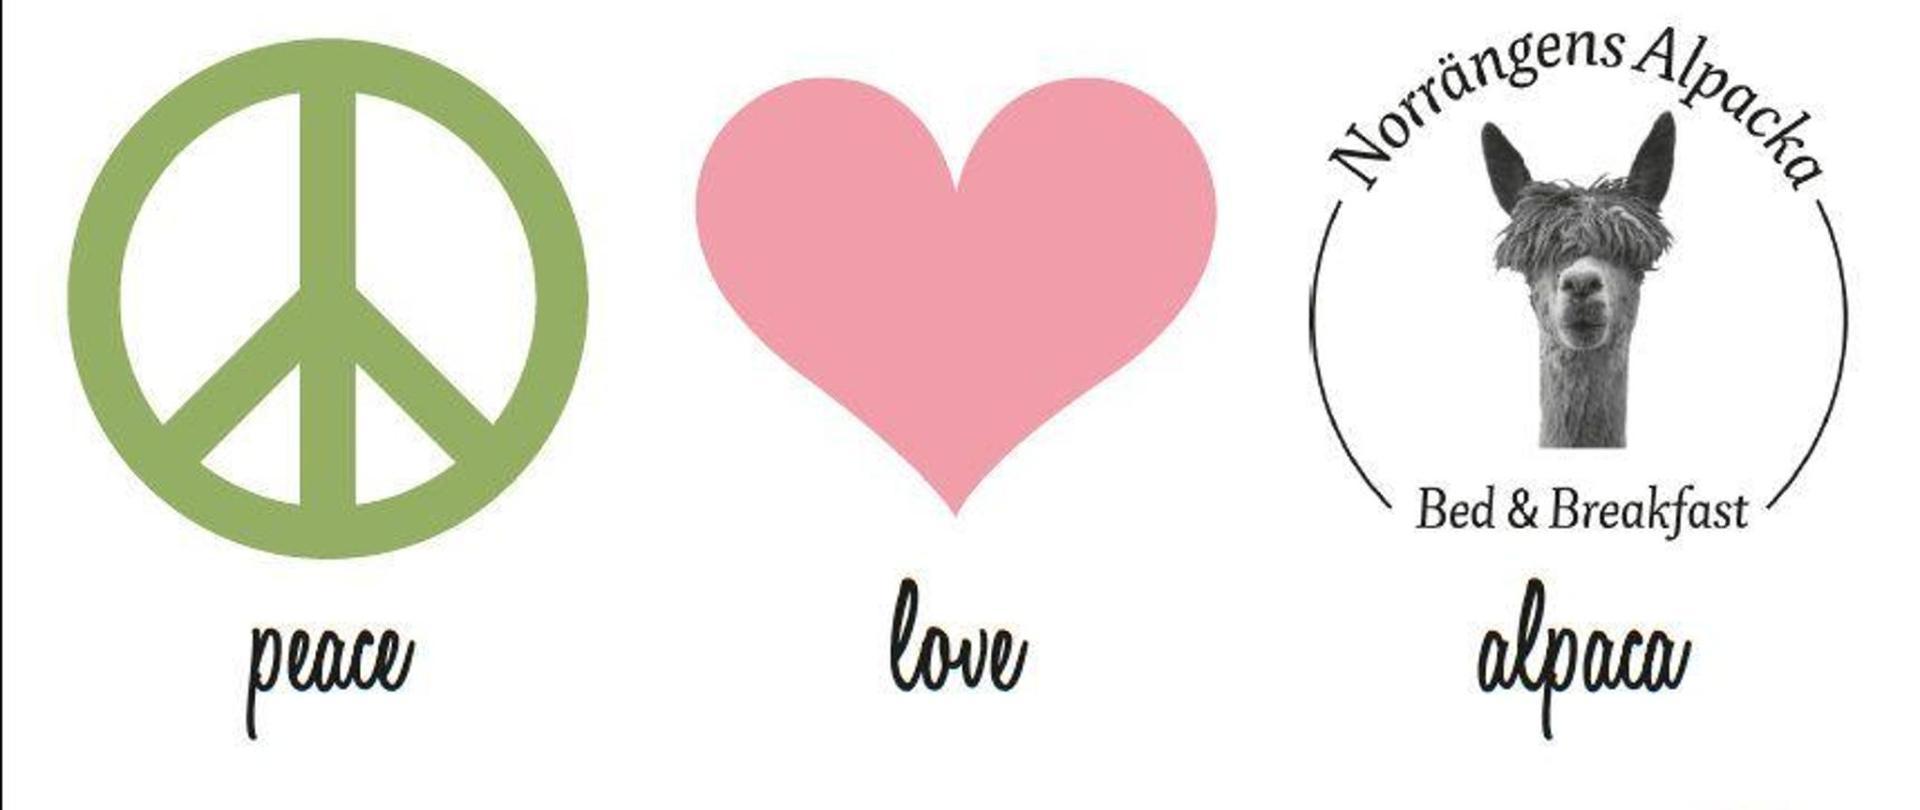 peace-love.jpg